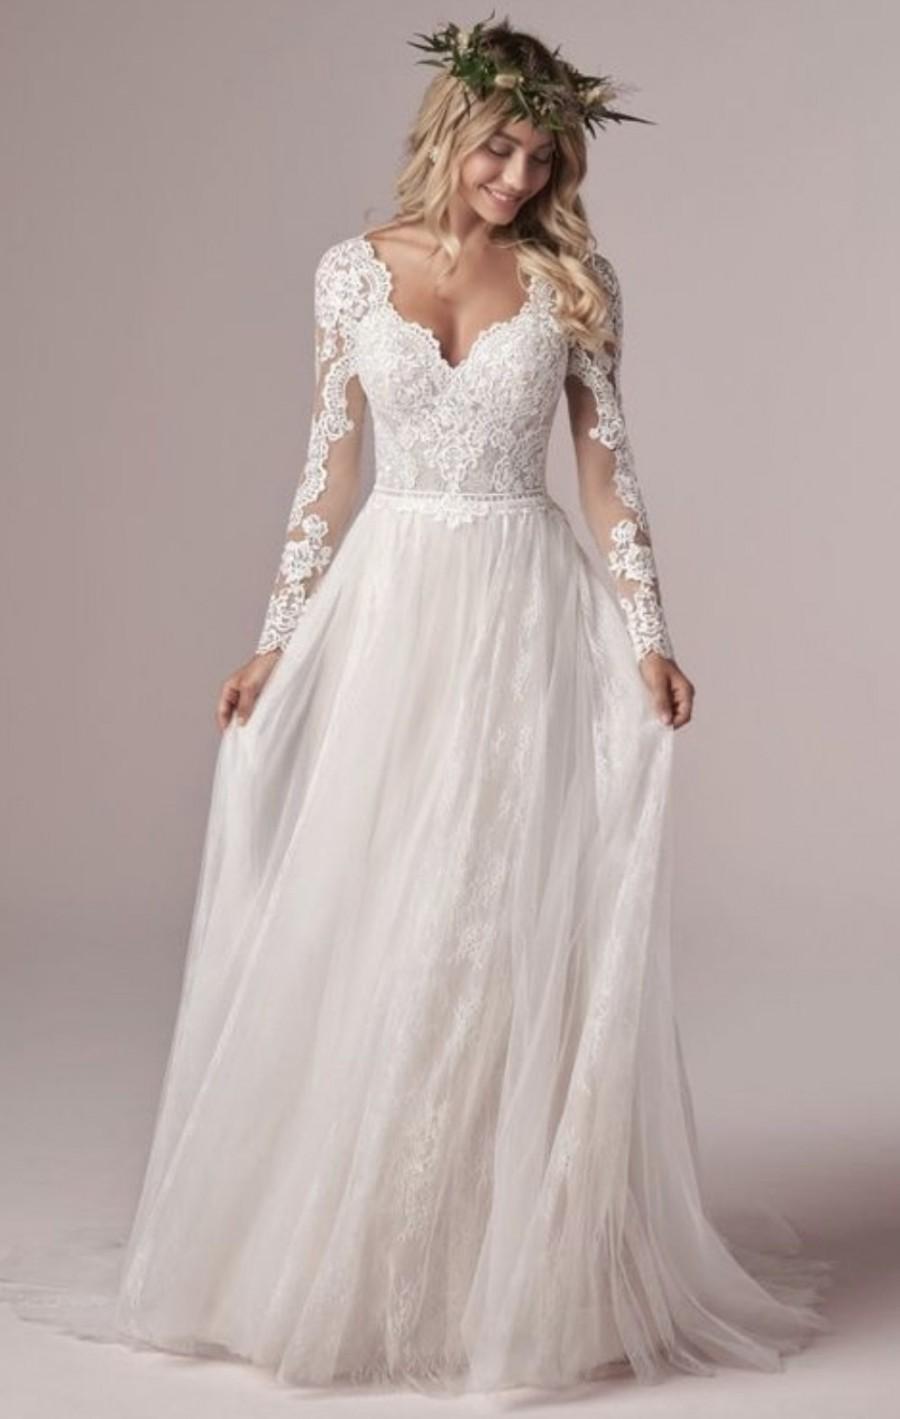 Mariage - Lace Design Long Sleeve Floor Length Bridal Gown, Floor Length Wedding Dress